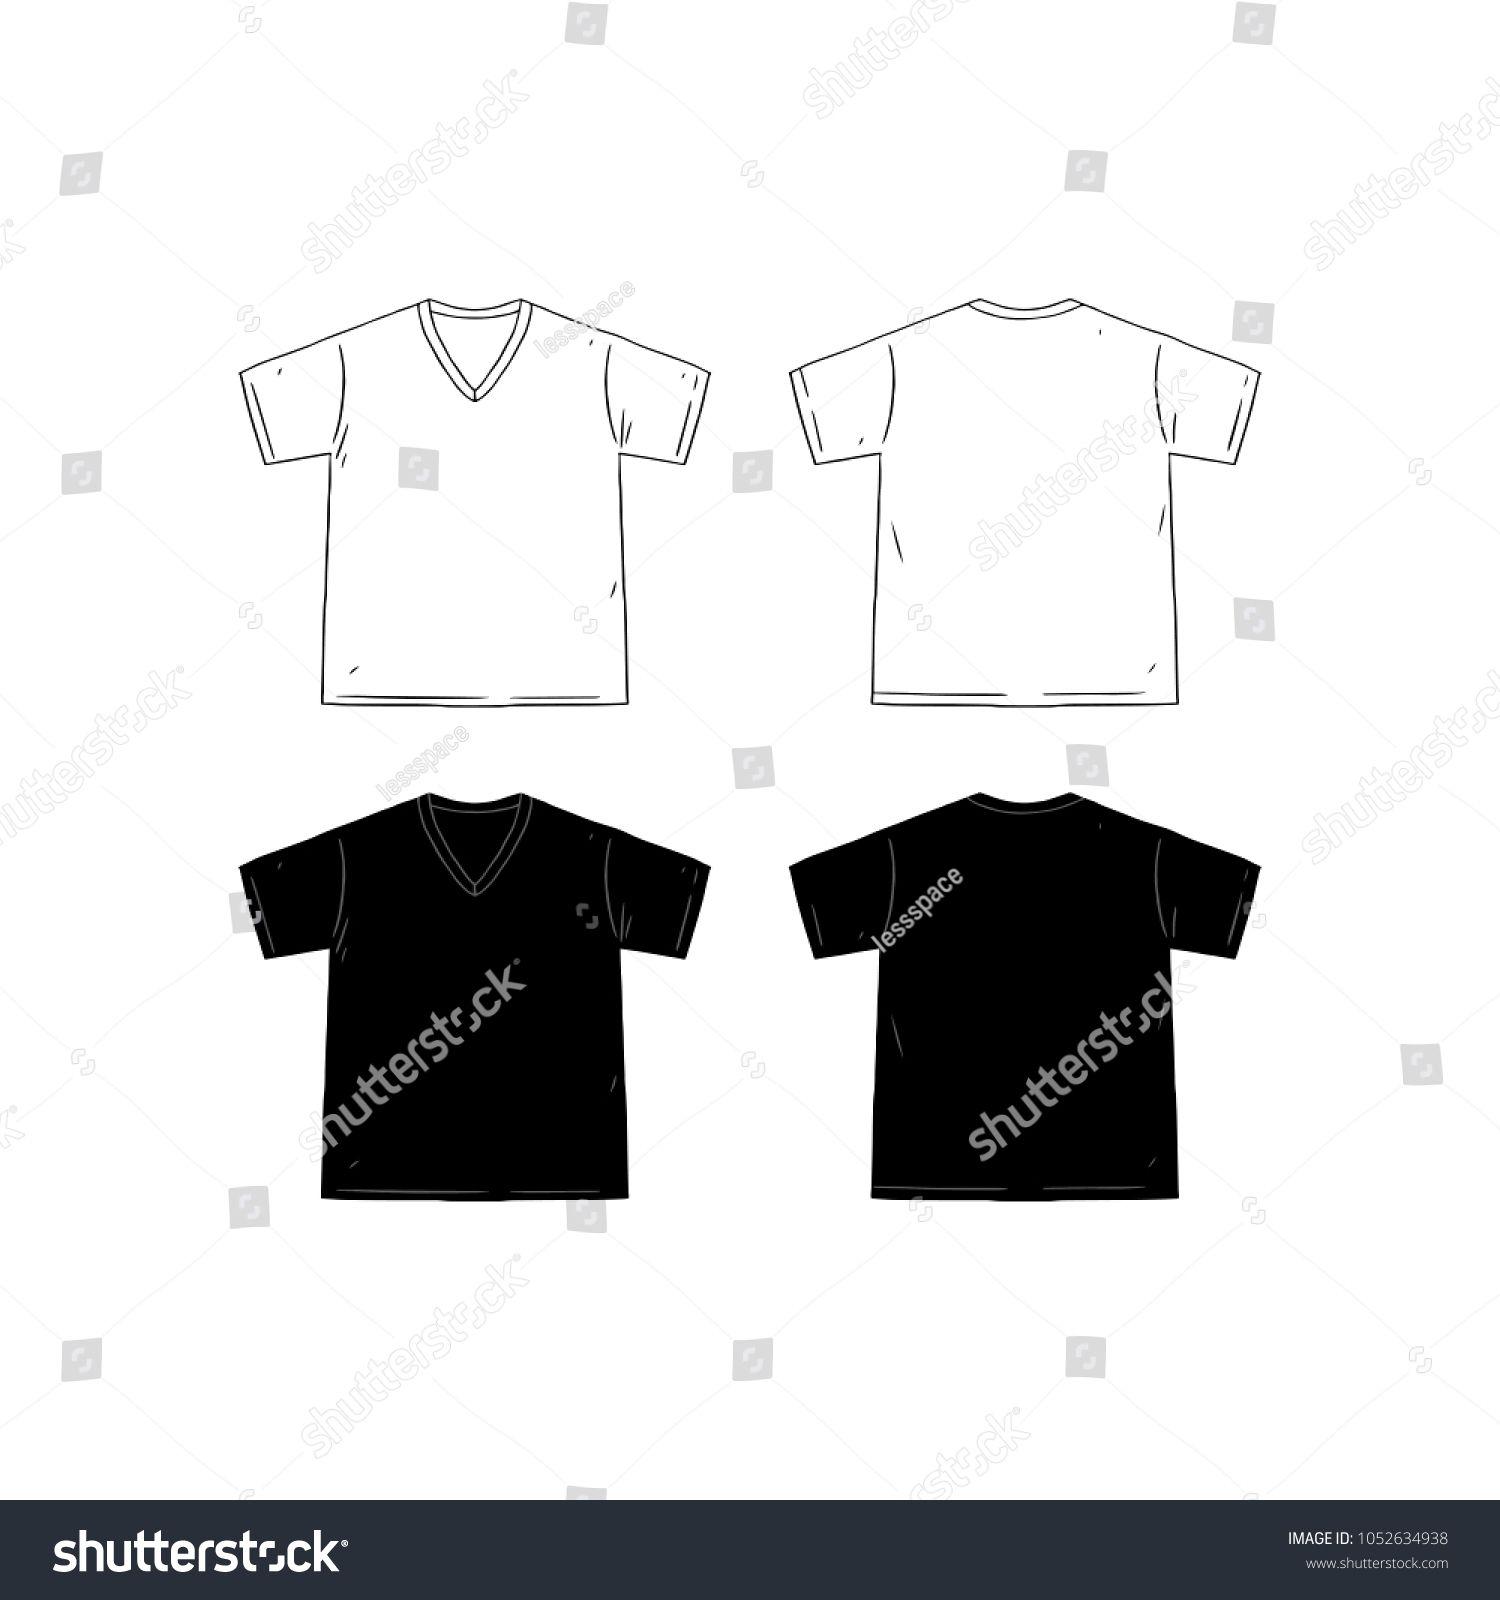 Set Blank Vneck Tshirt Design Template Stock Vector Royalty Within Blank V Neck T Shirt Template Best Sample T Shirt Template Tshirt Designs Design Template